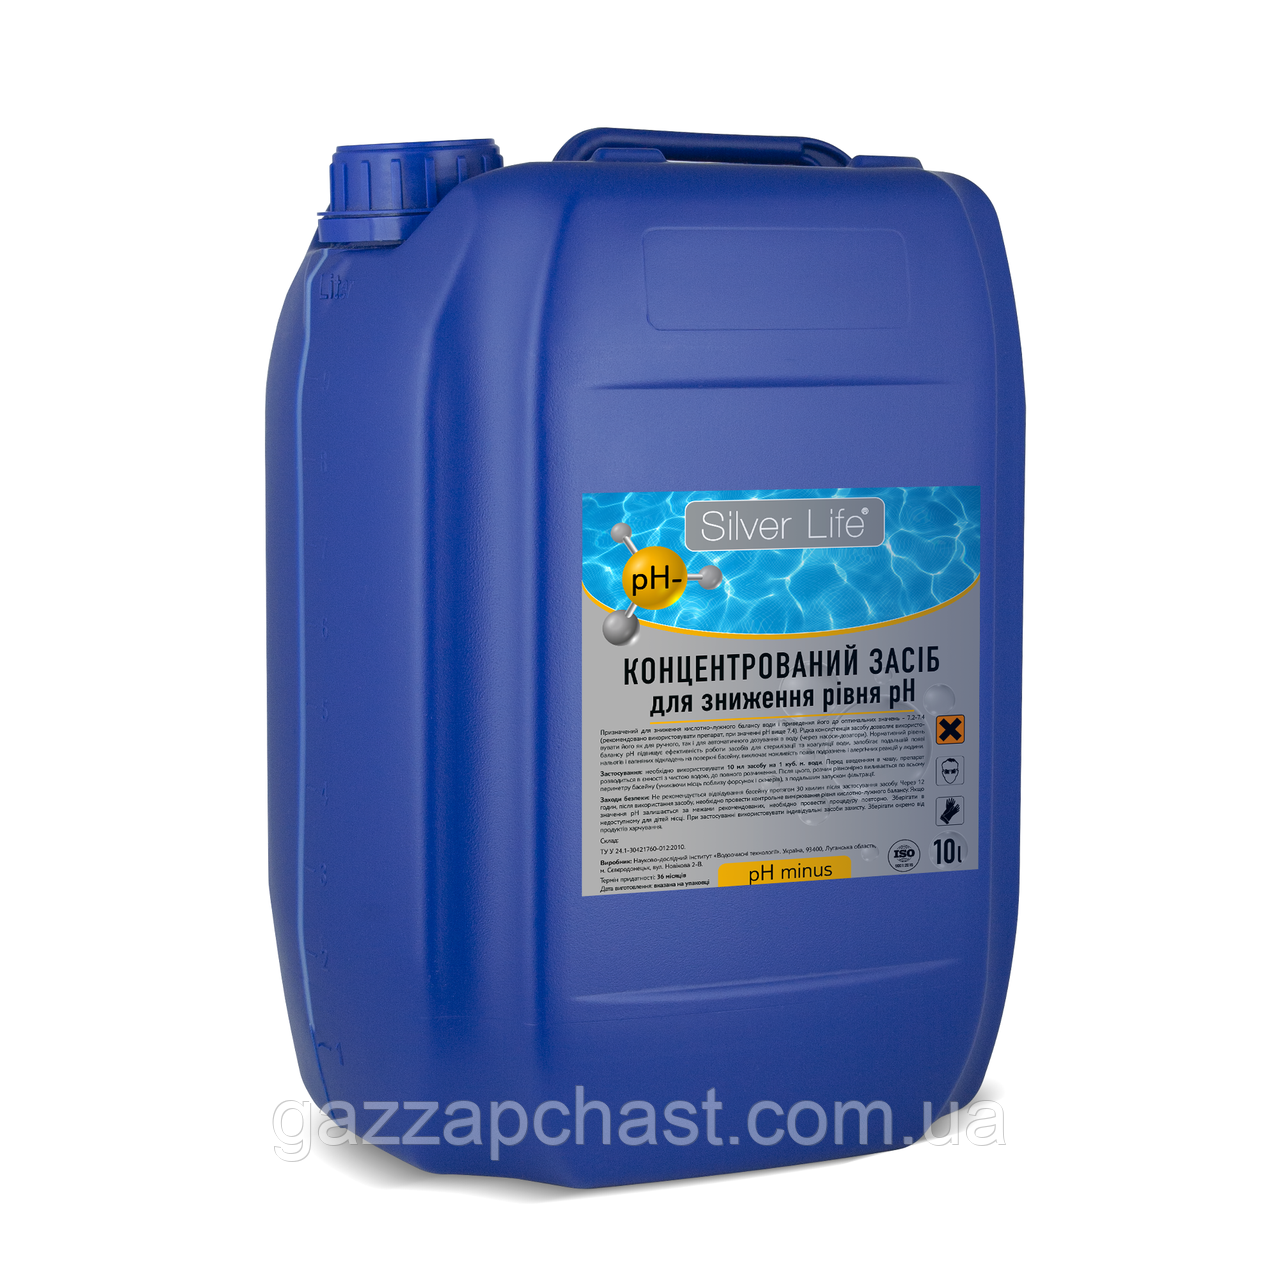 Средство для снижения уровня pH воды в бассейне Silver Life pH Minus, 10 л